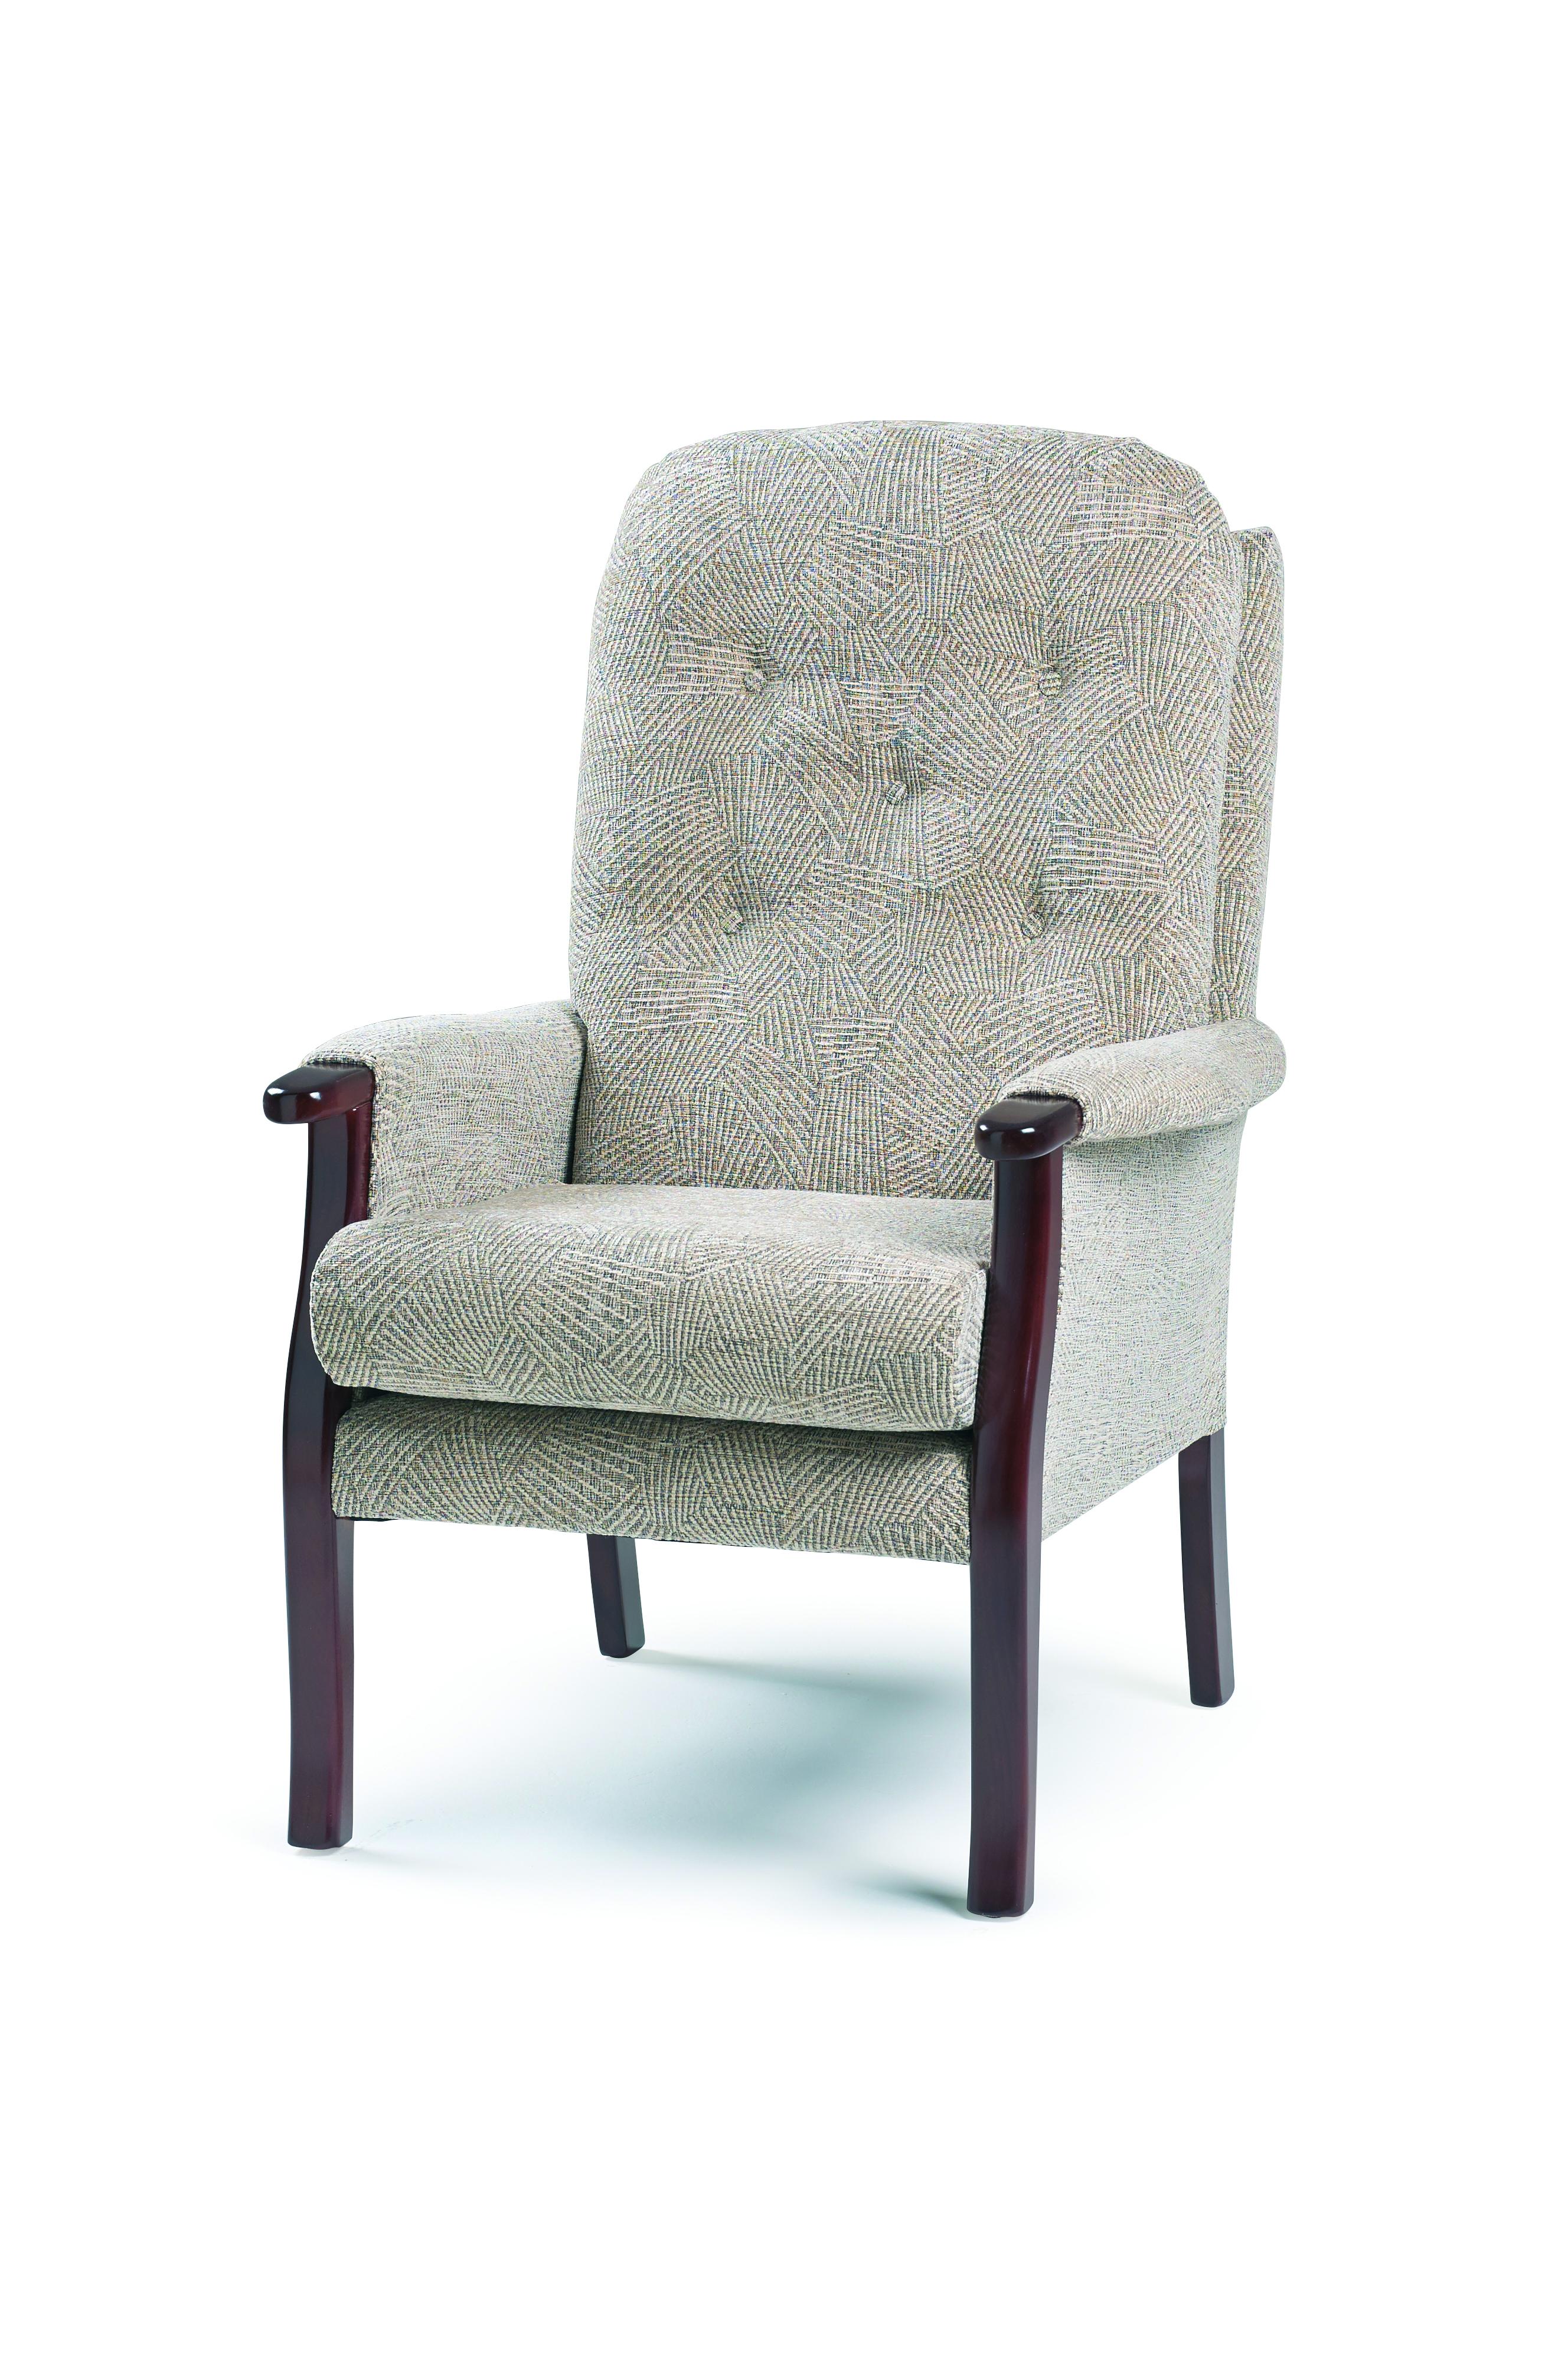 Orthopaedic Fireside Montana Brushstrokes Oatmeal Chair